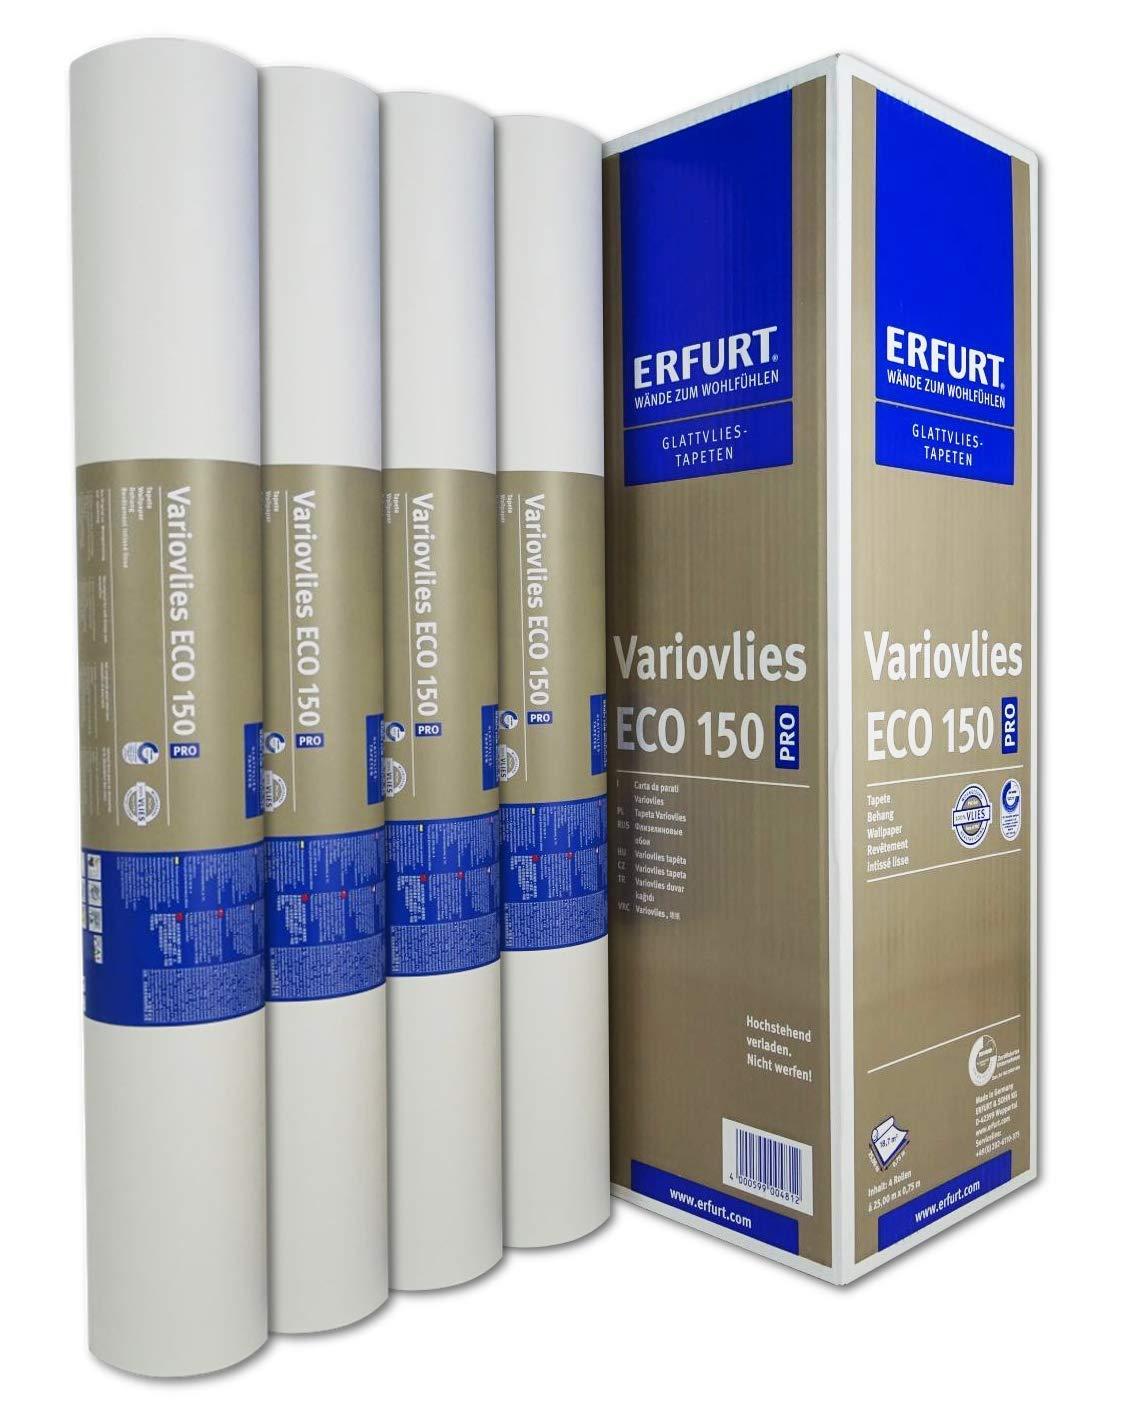 Erfurt Eco-Vlies EV 150g//qm Ecovlies Variovlies Malervlies /überstreichbare Vliestapete 8 Rollen